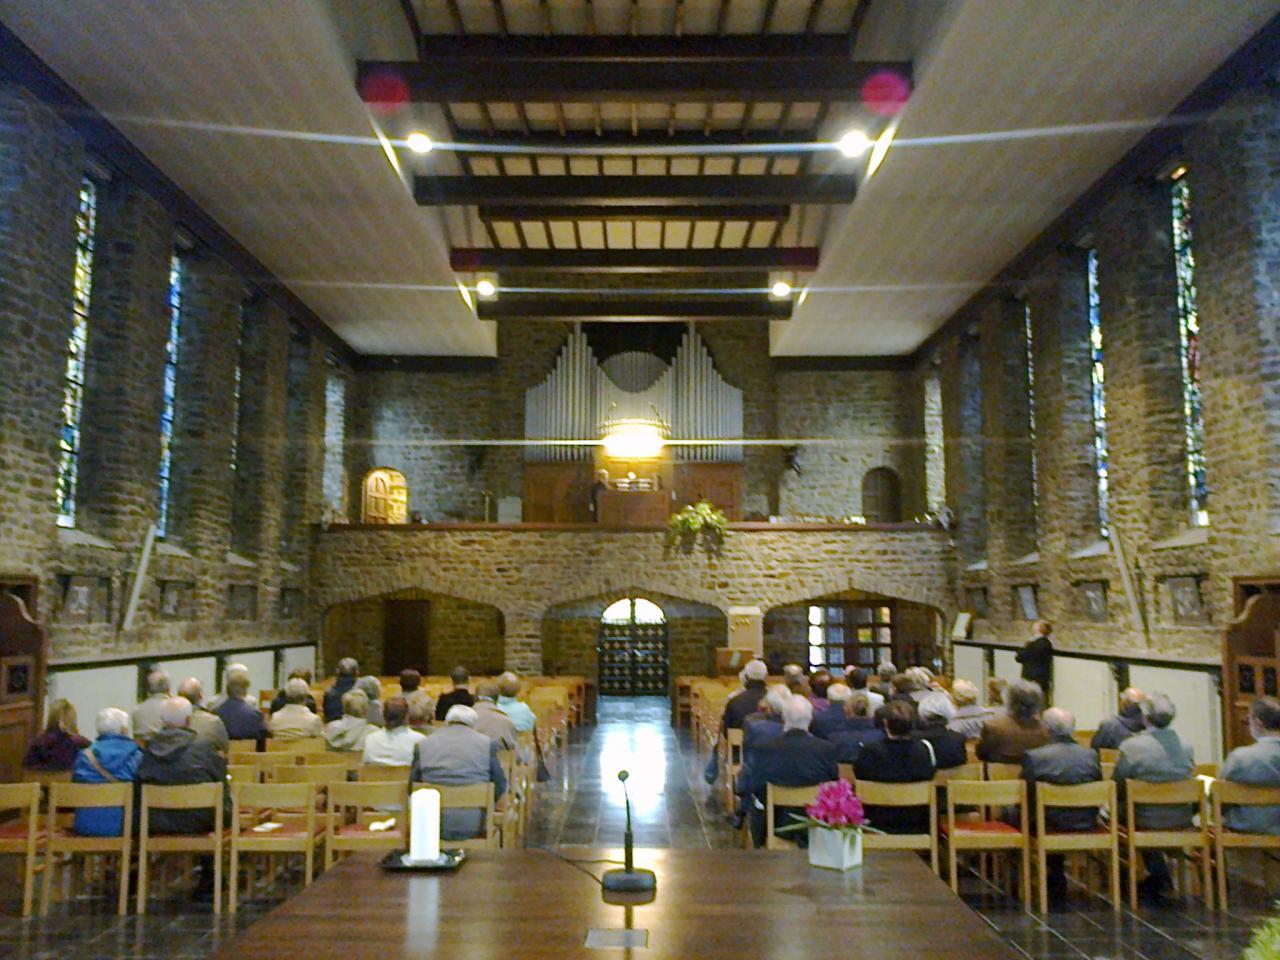 Concert d'orgue par l'OrgueStudio de l'IMEP - 31 Mai 2015 - Nalinnes-Haies